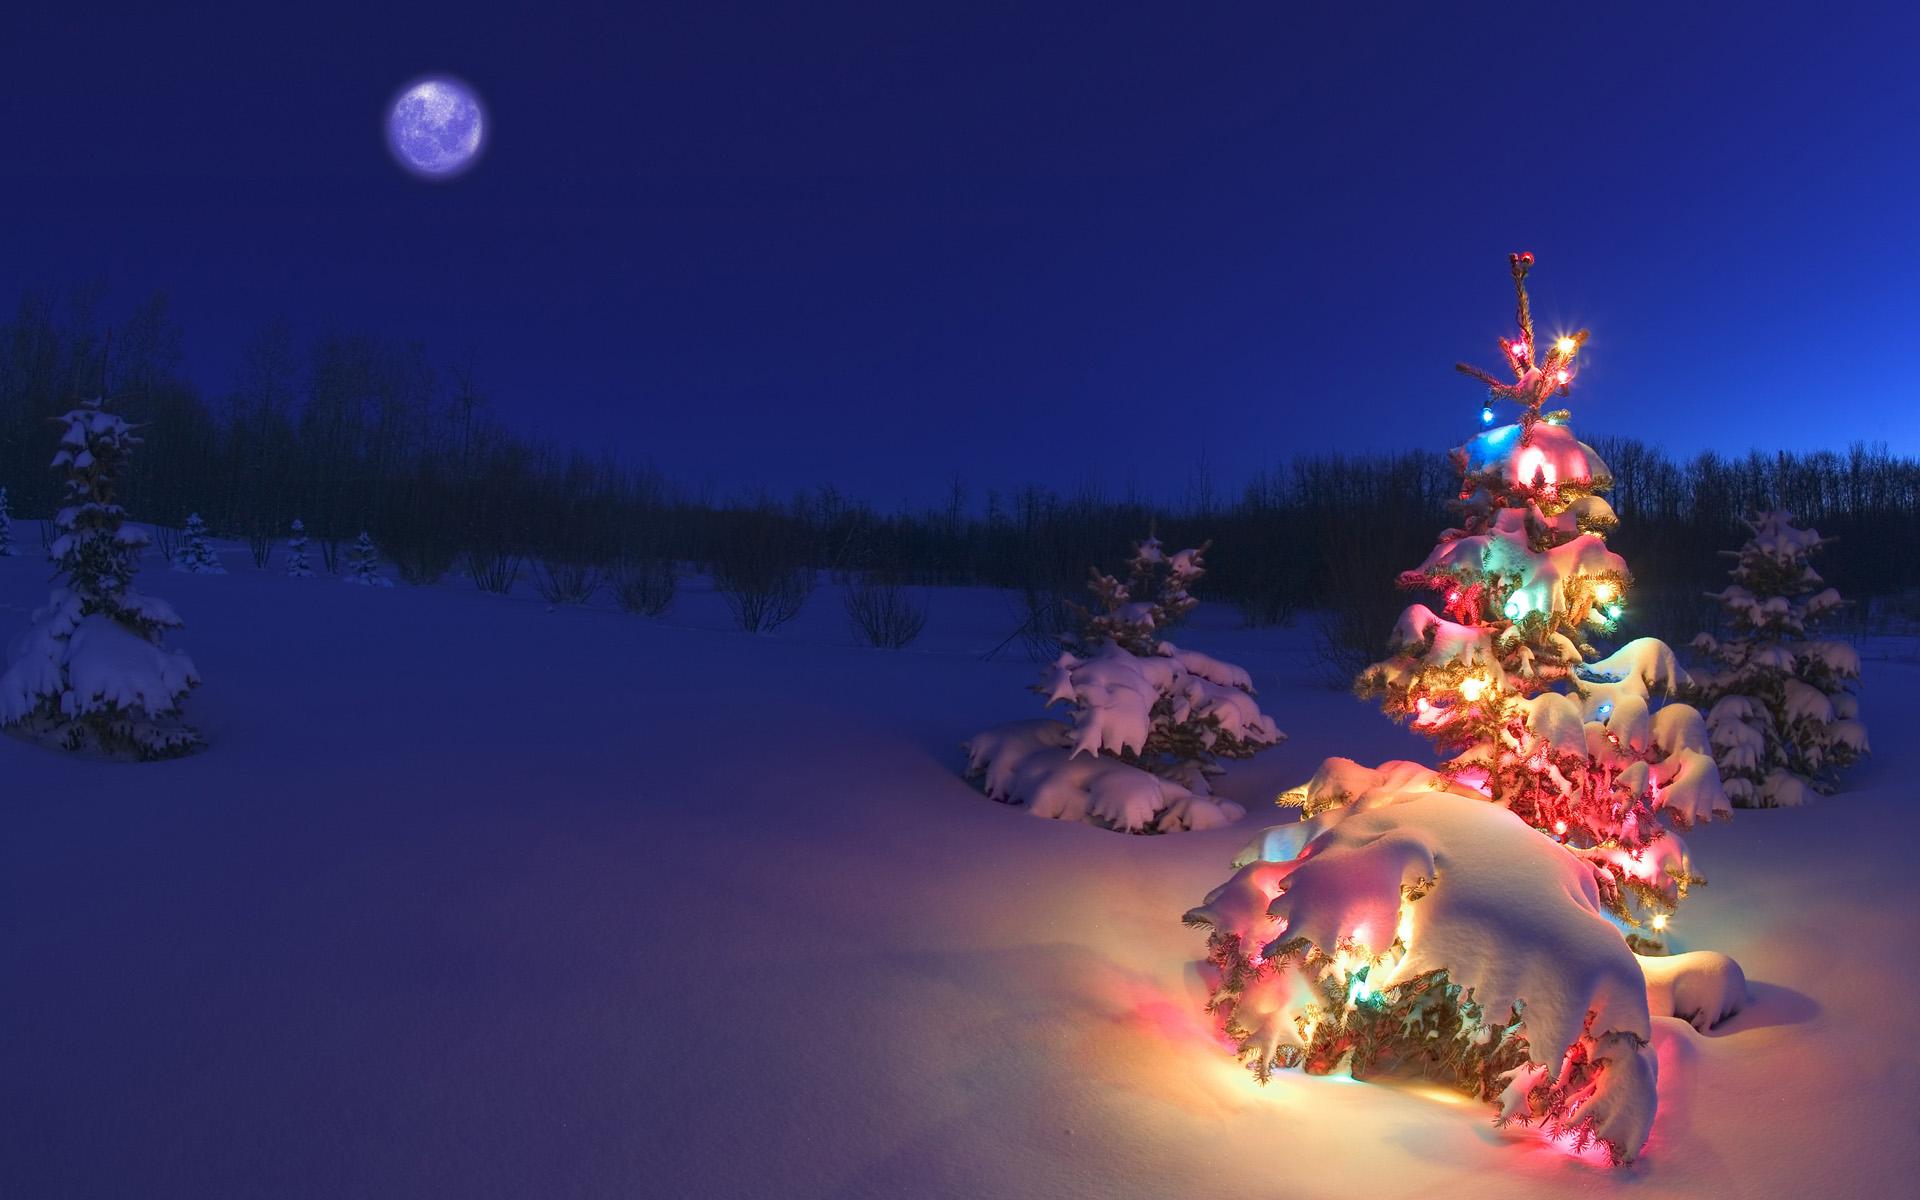 Family Quotes Wallpaper Hd Merry Christmas Tree Free Download Wallpaper Pixelstalk Net